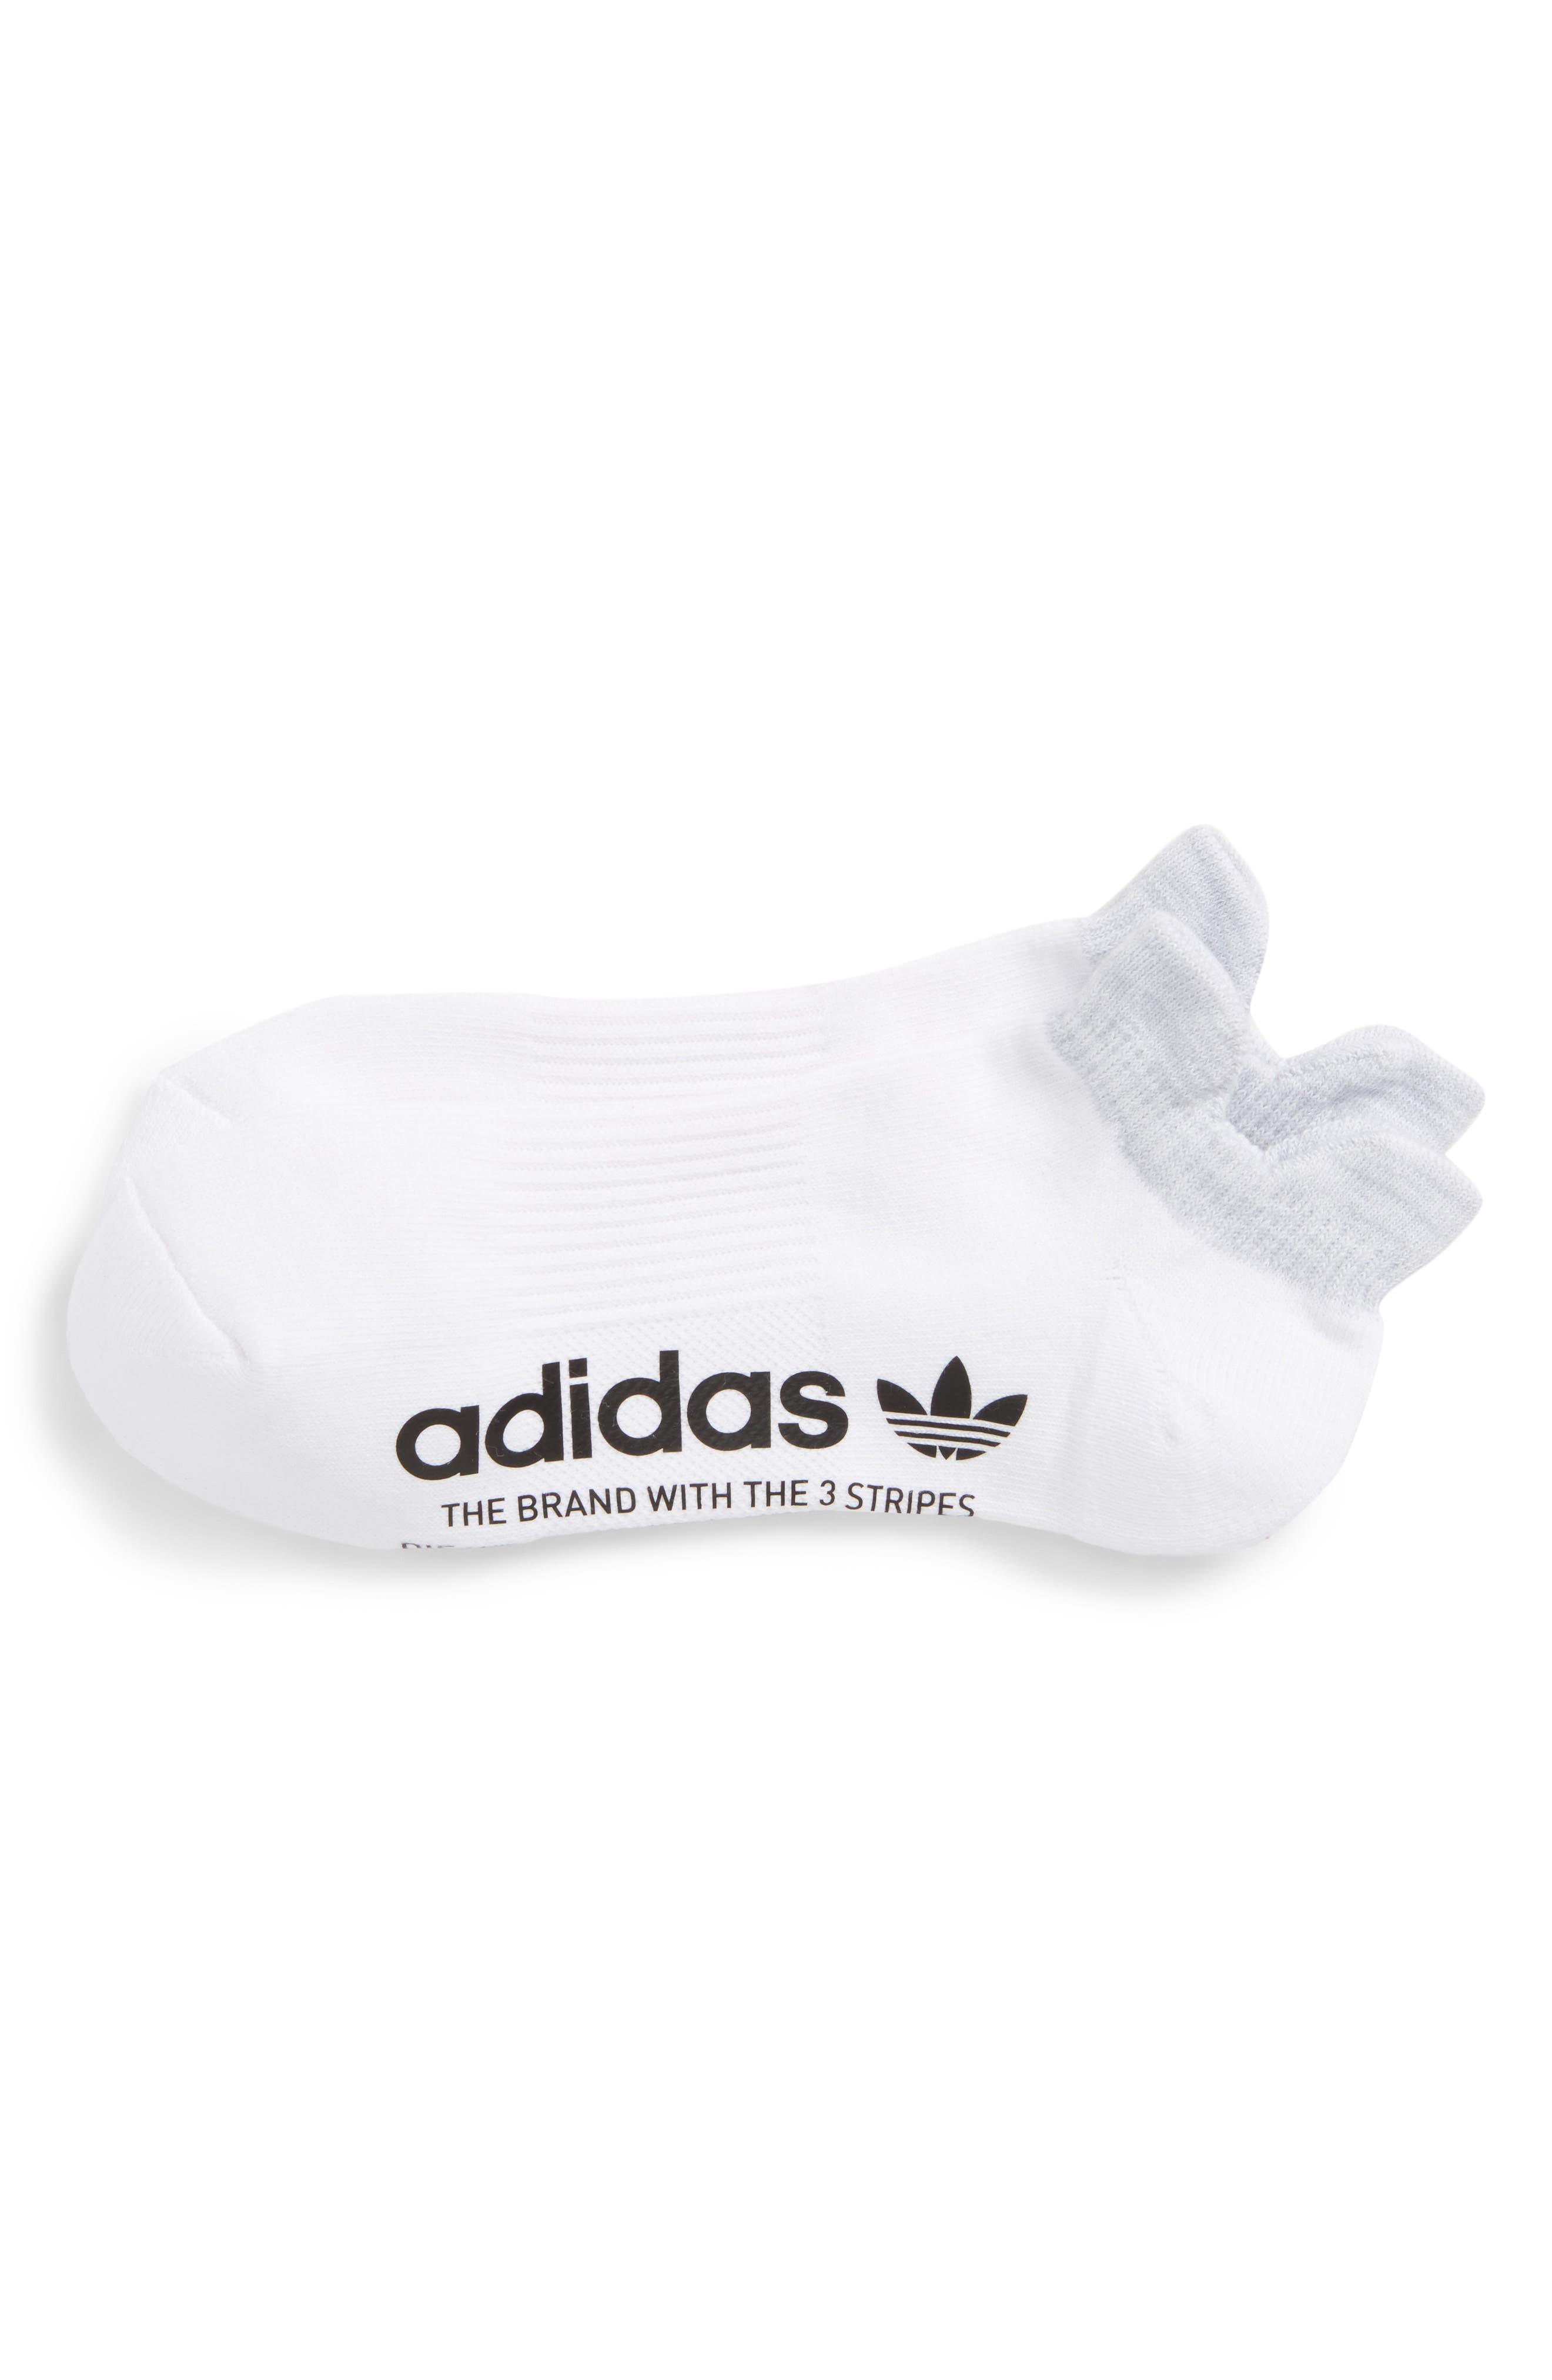 Running Socks,                             Main thumbnail 1, color,                             White/ Clear Onyx Space Dye